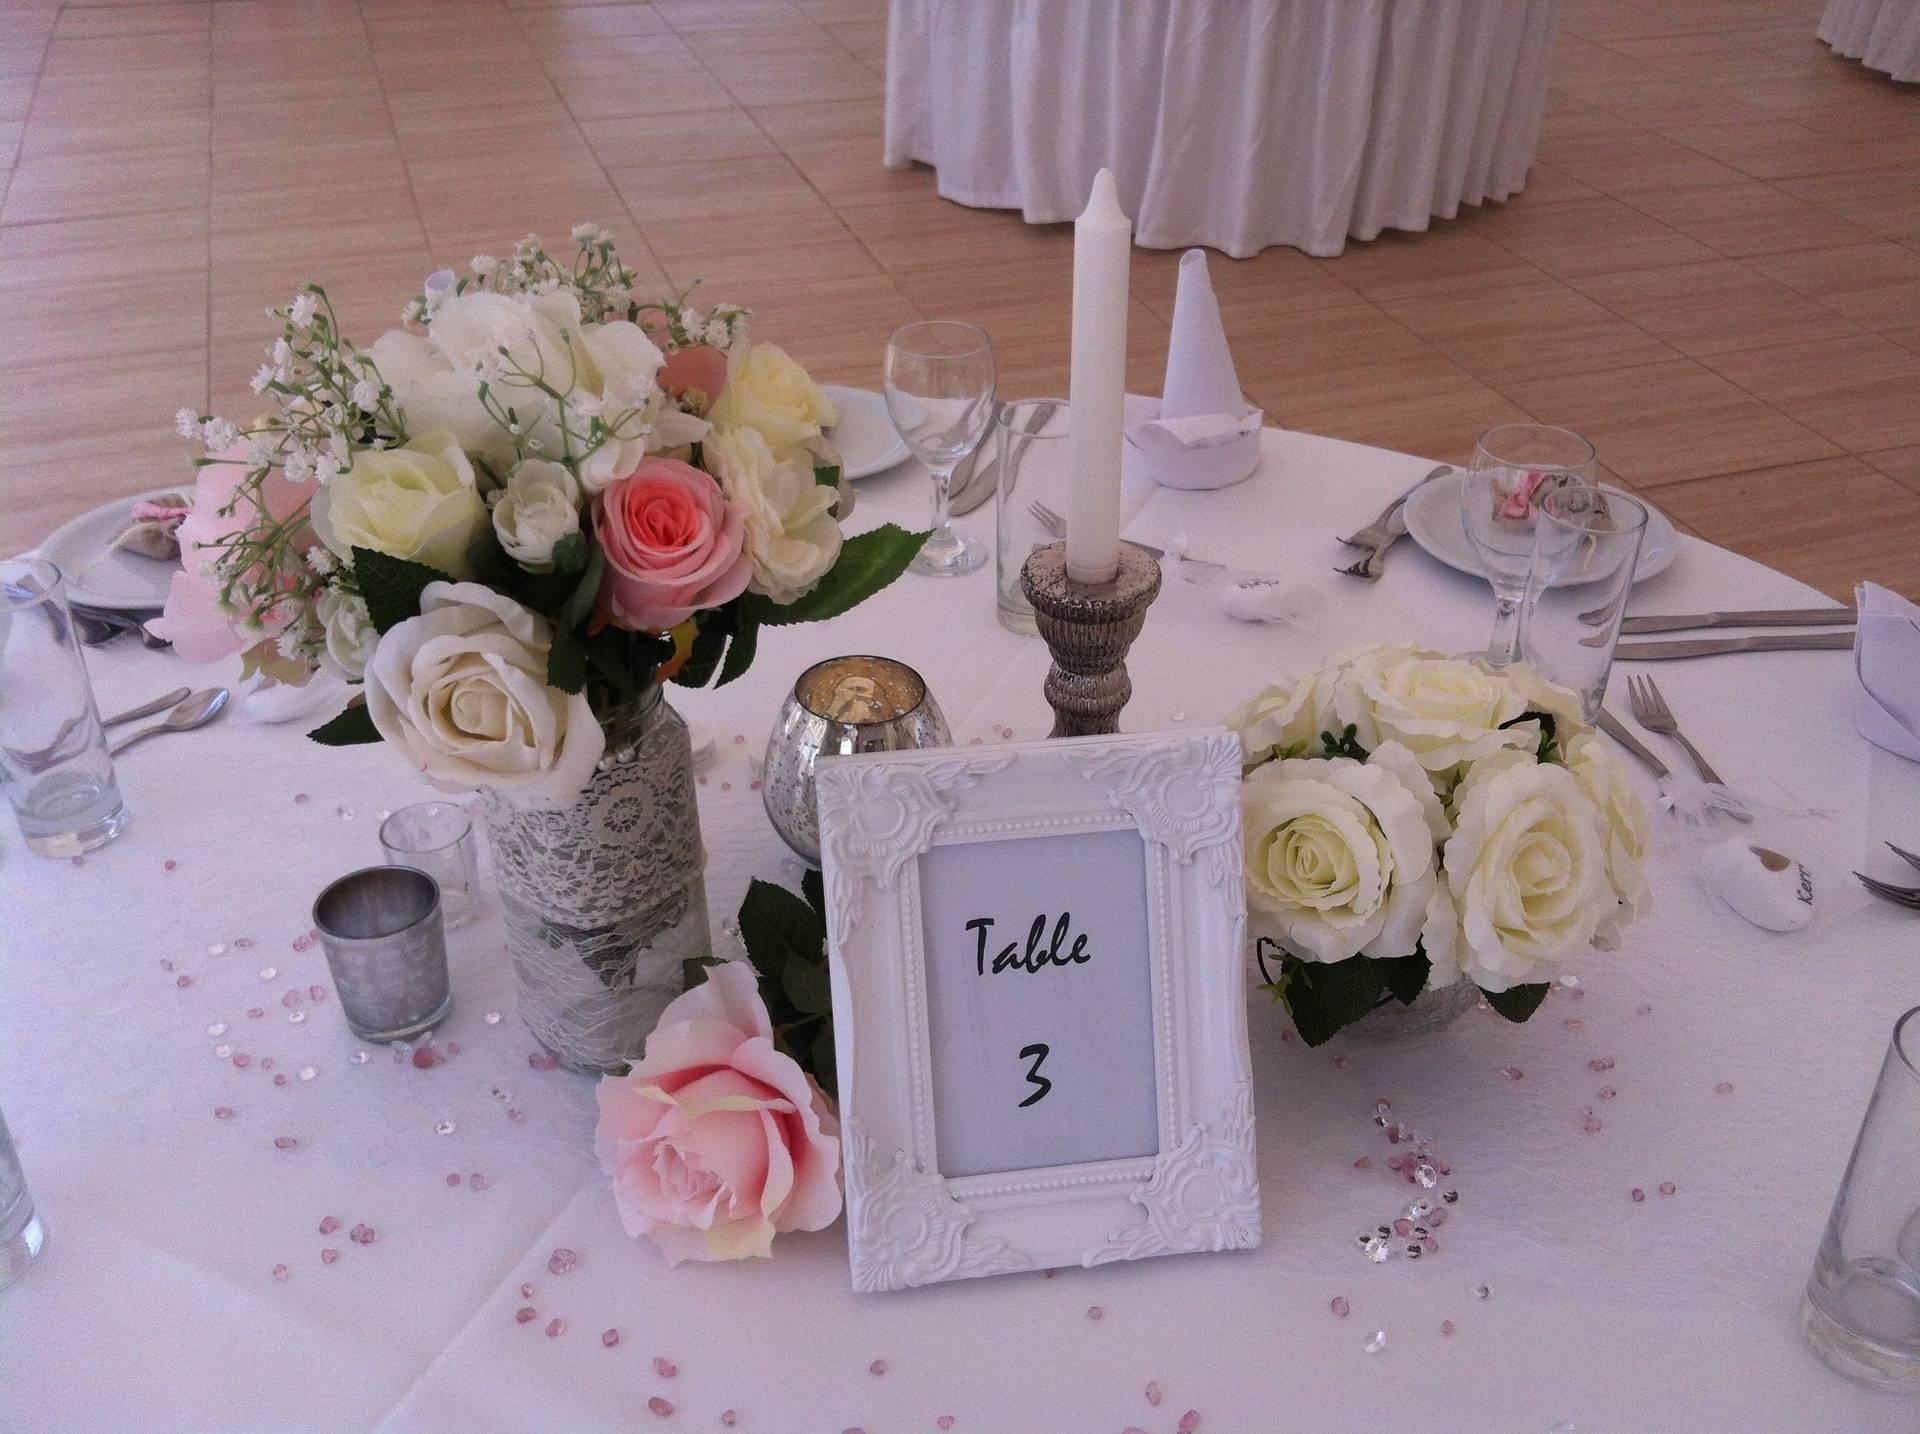 Rose vase arrangement.